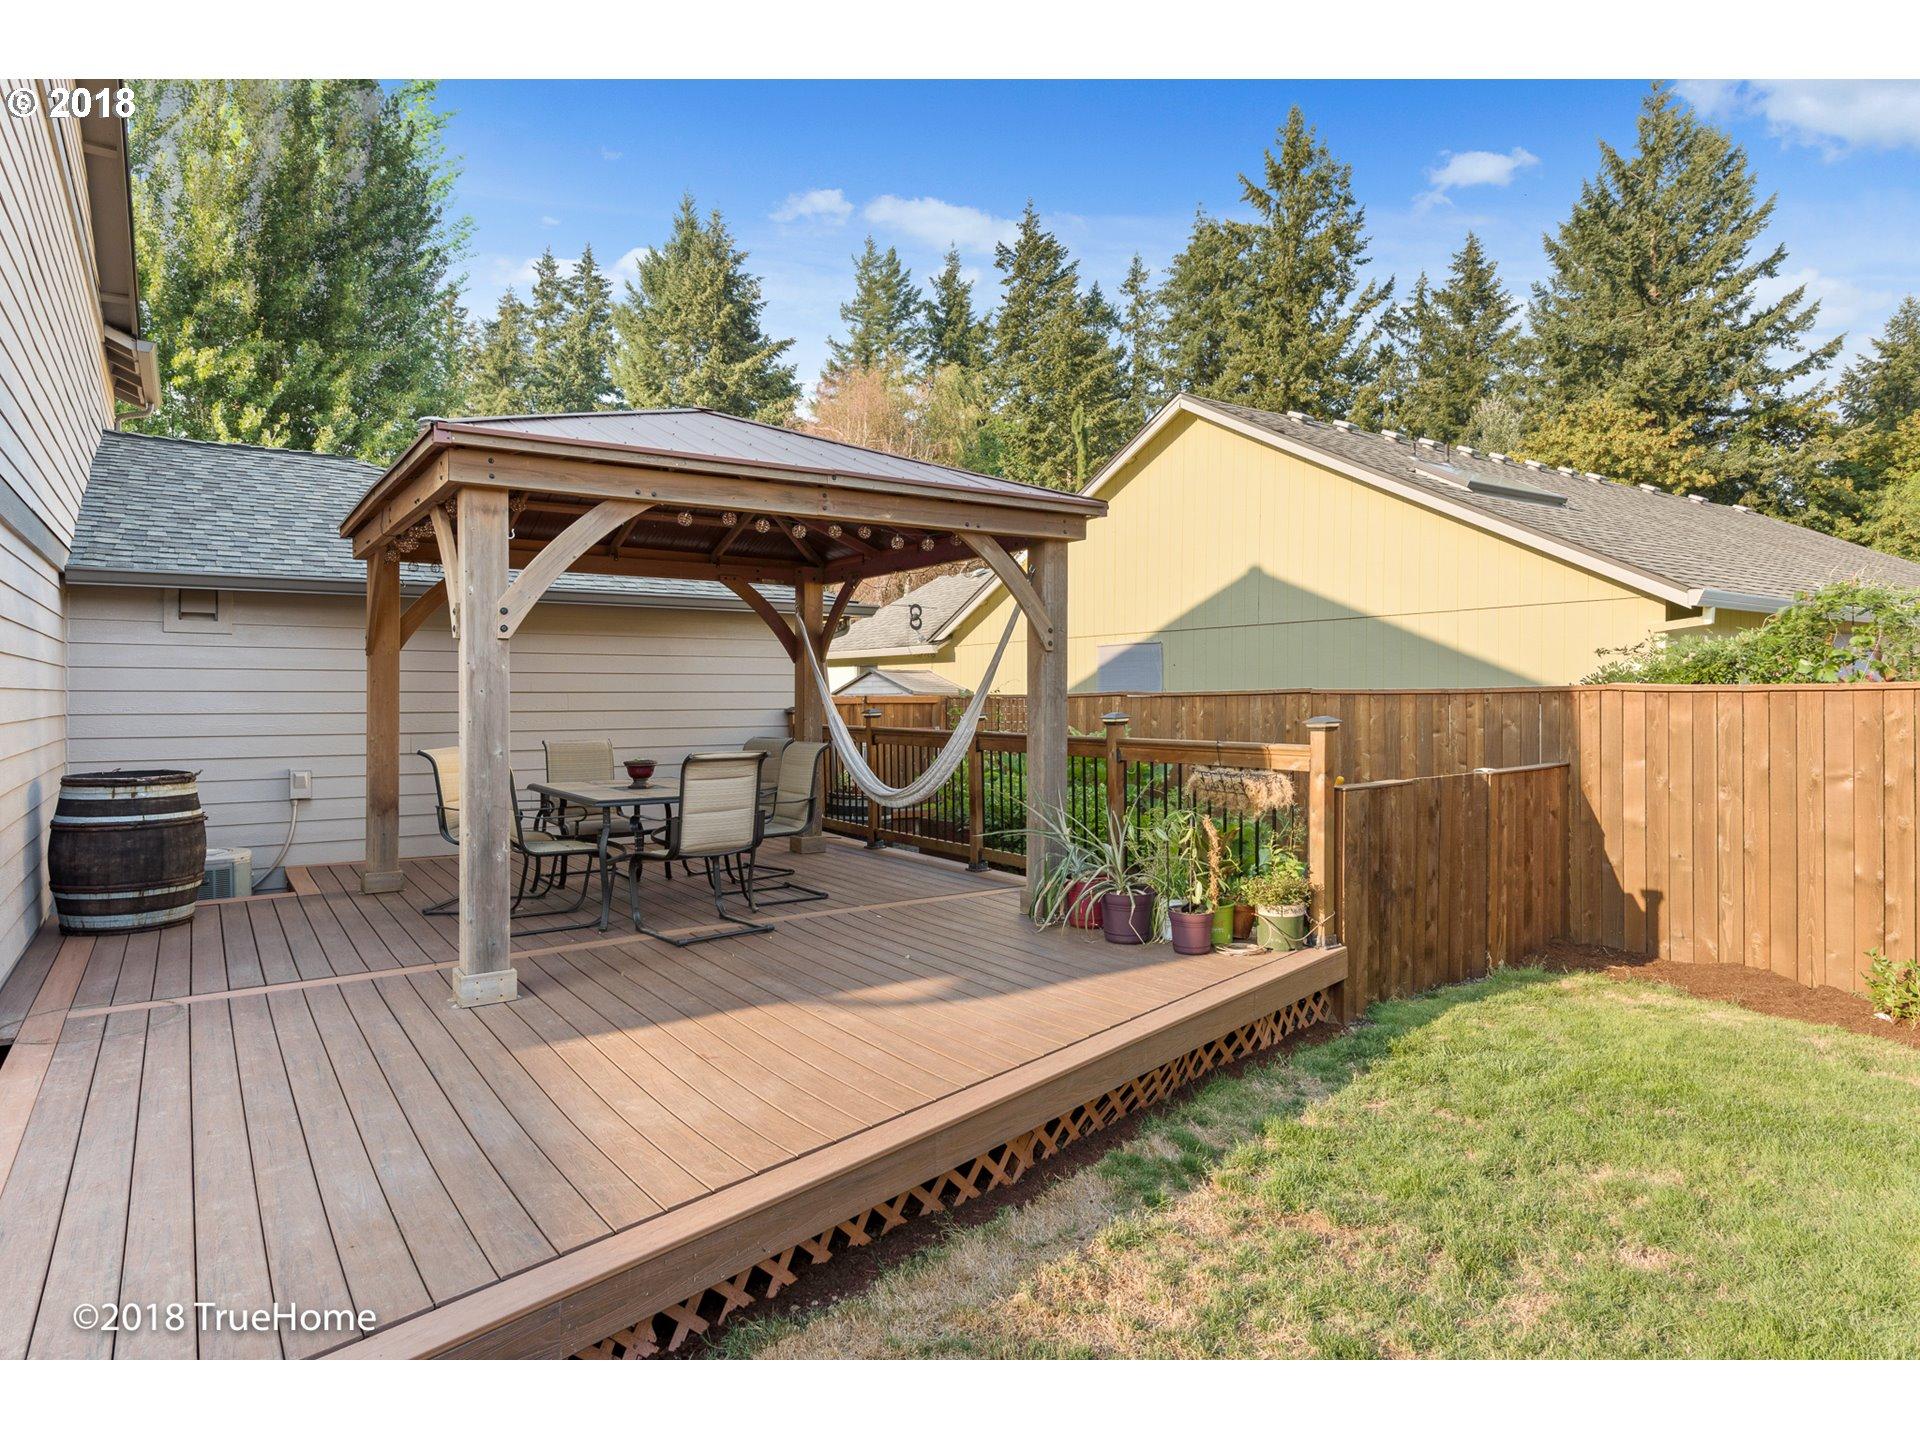 11011 NE 51ST CT Vancouver, WA 98686 - MLS #: 18628493